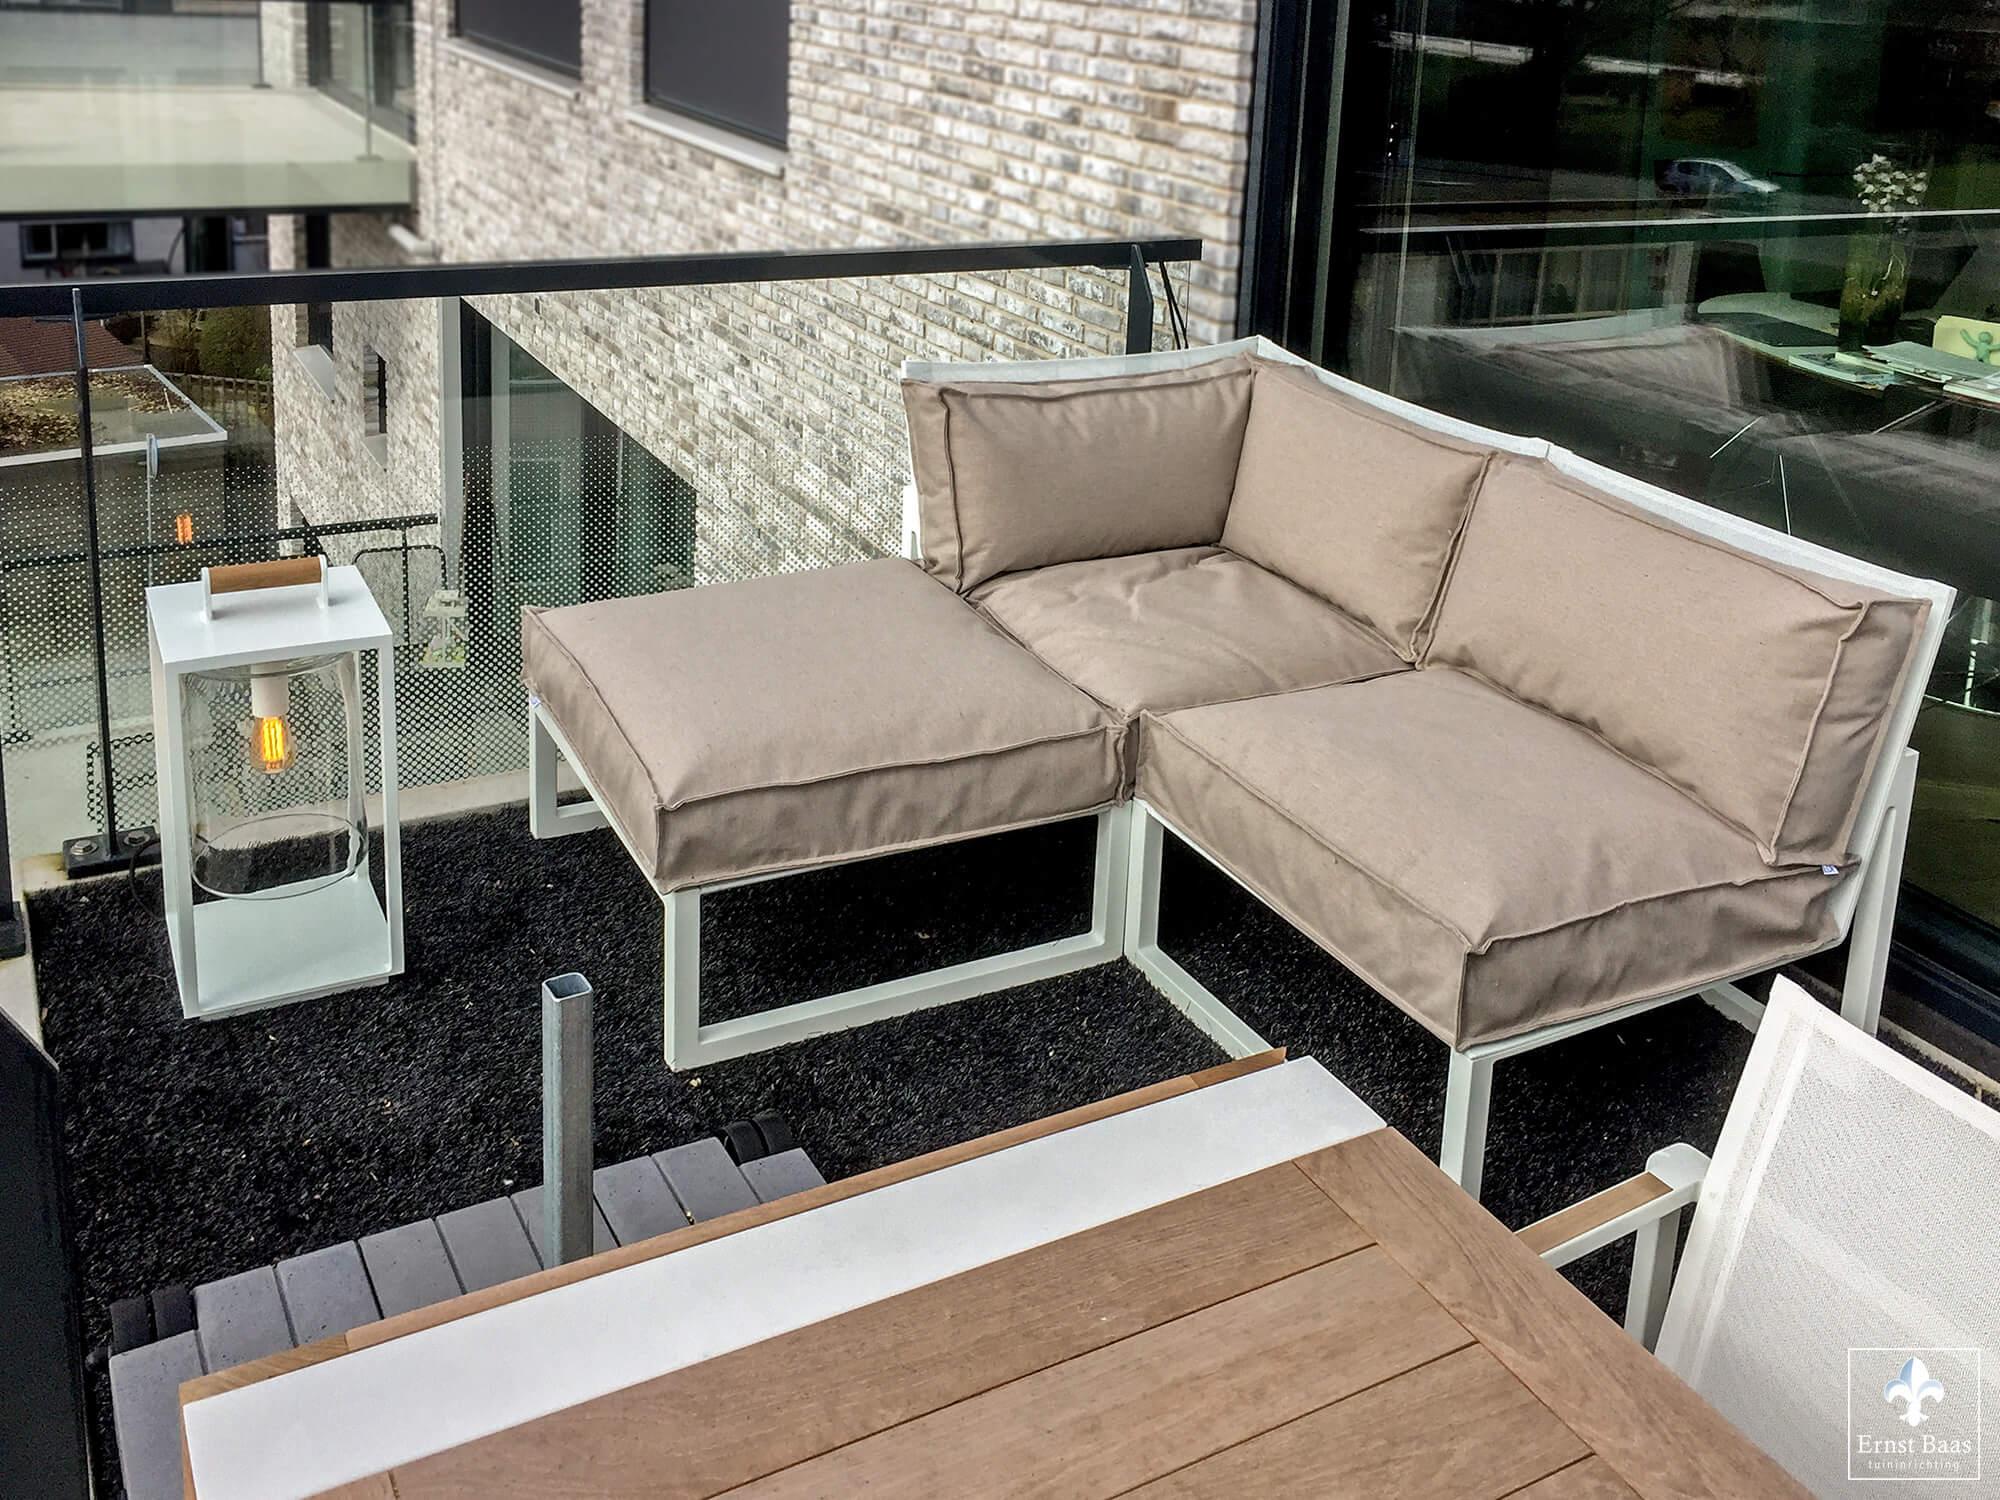 multifunctioneel dakterras in gouda ernst baas tuininrichting design tuinmeubelen. Black Bedroom Furniture Sets. Home Design Ideas